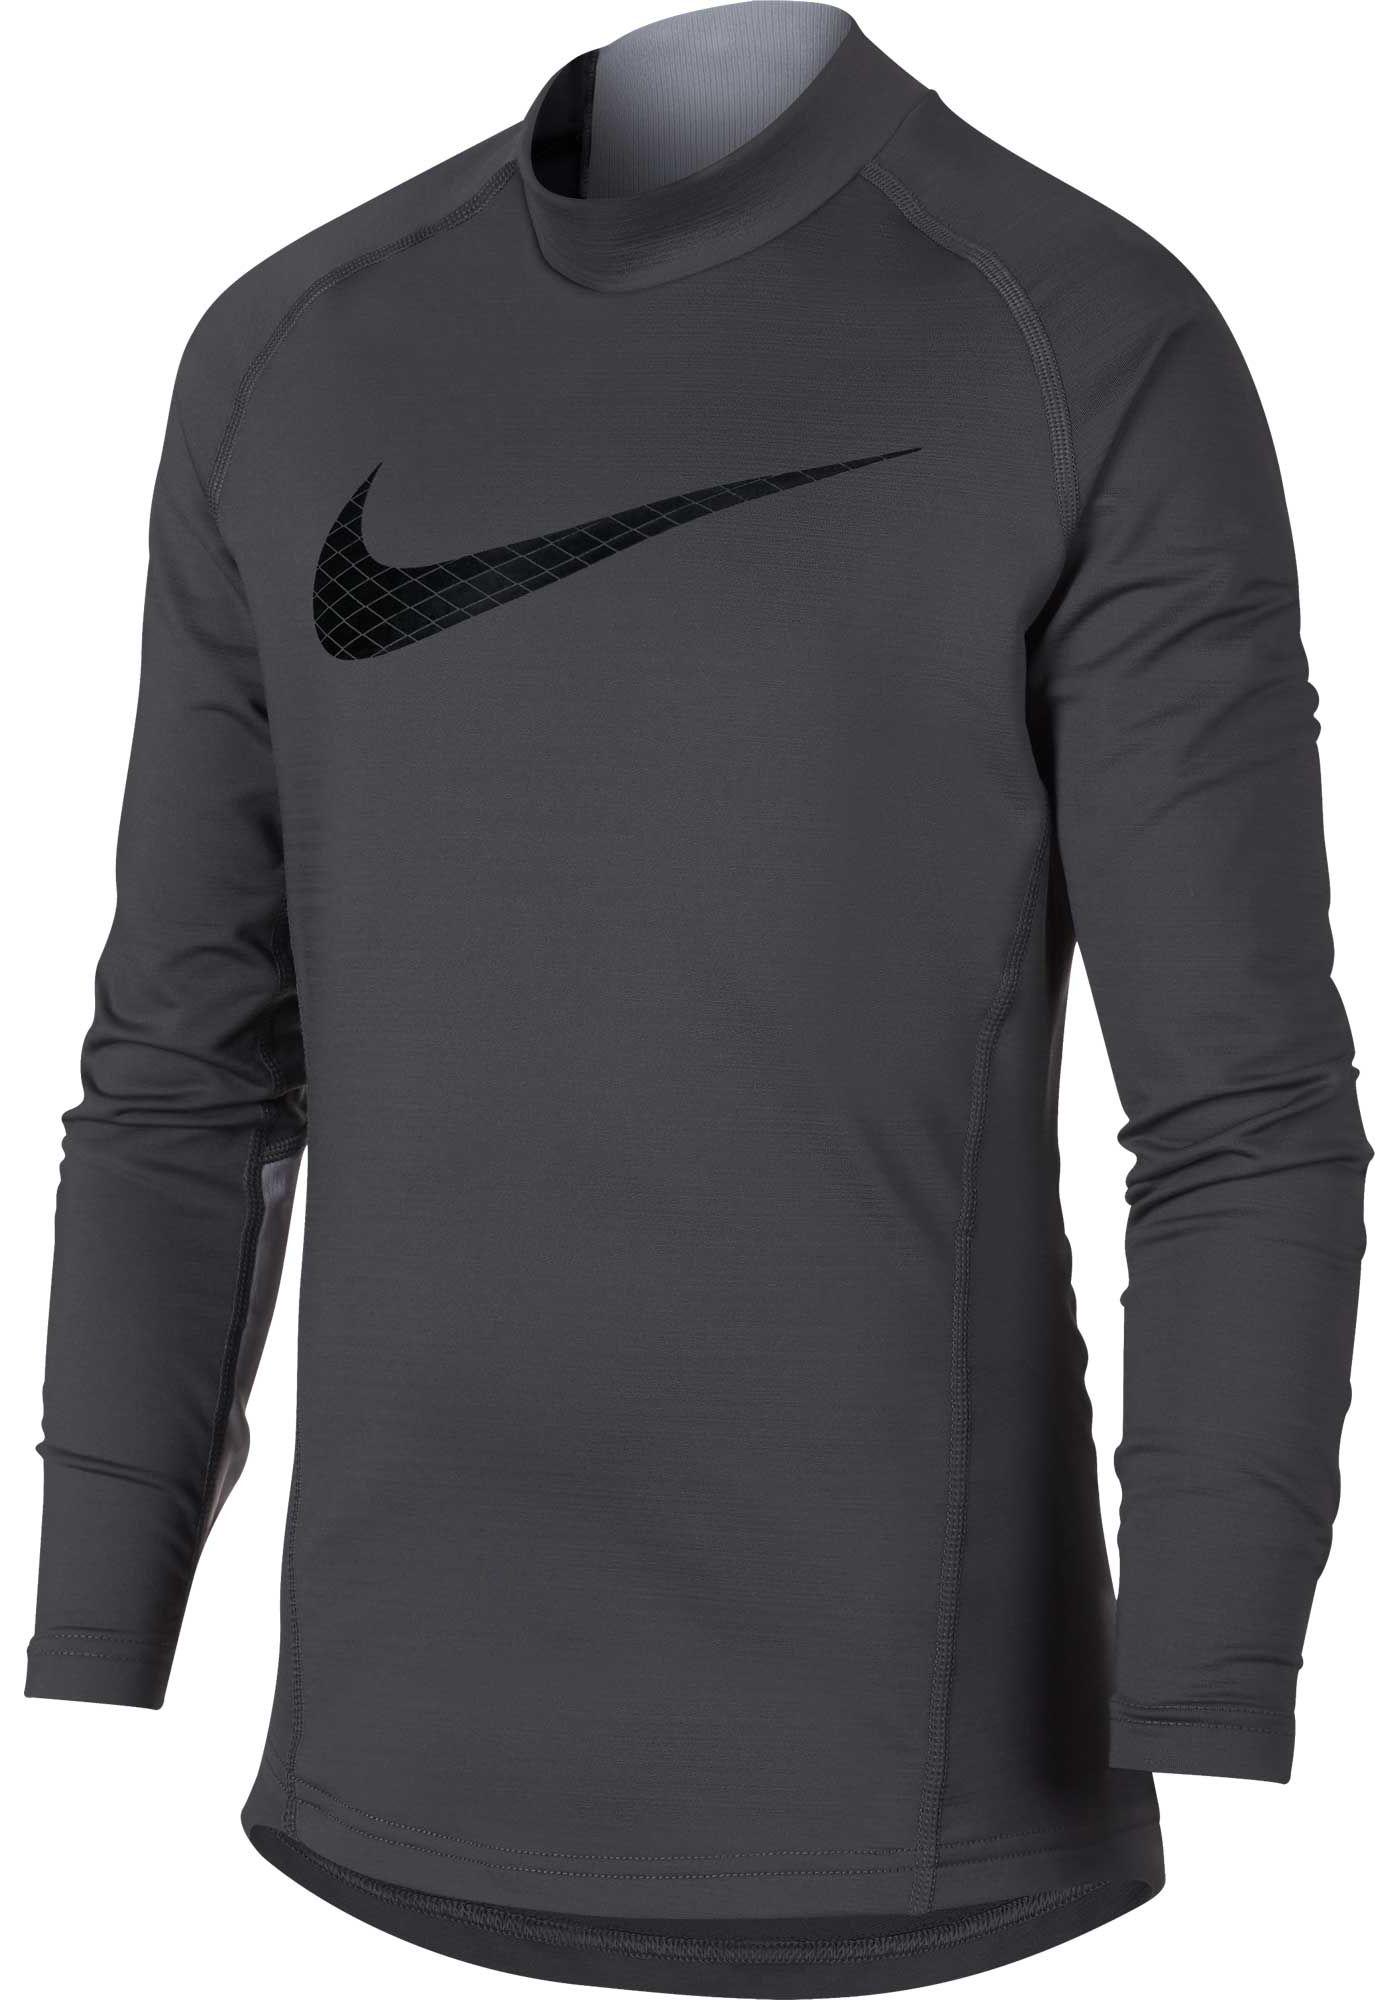 Nike Boys' Dri-FIT Mock Neck Compression Shirt